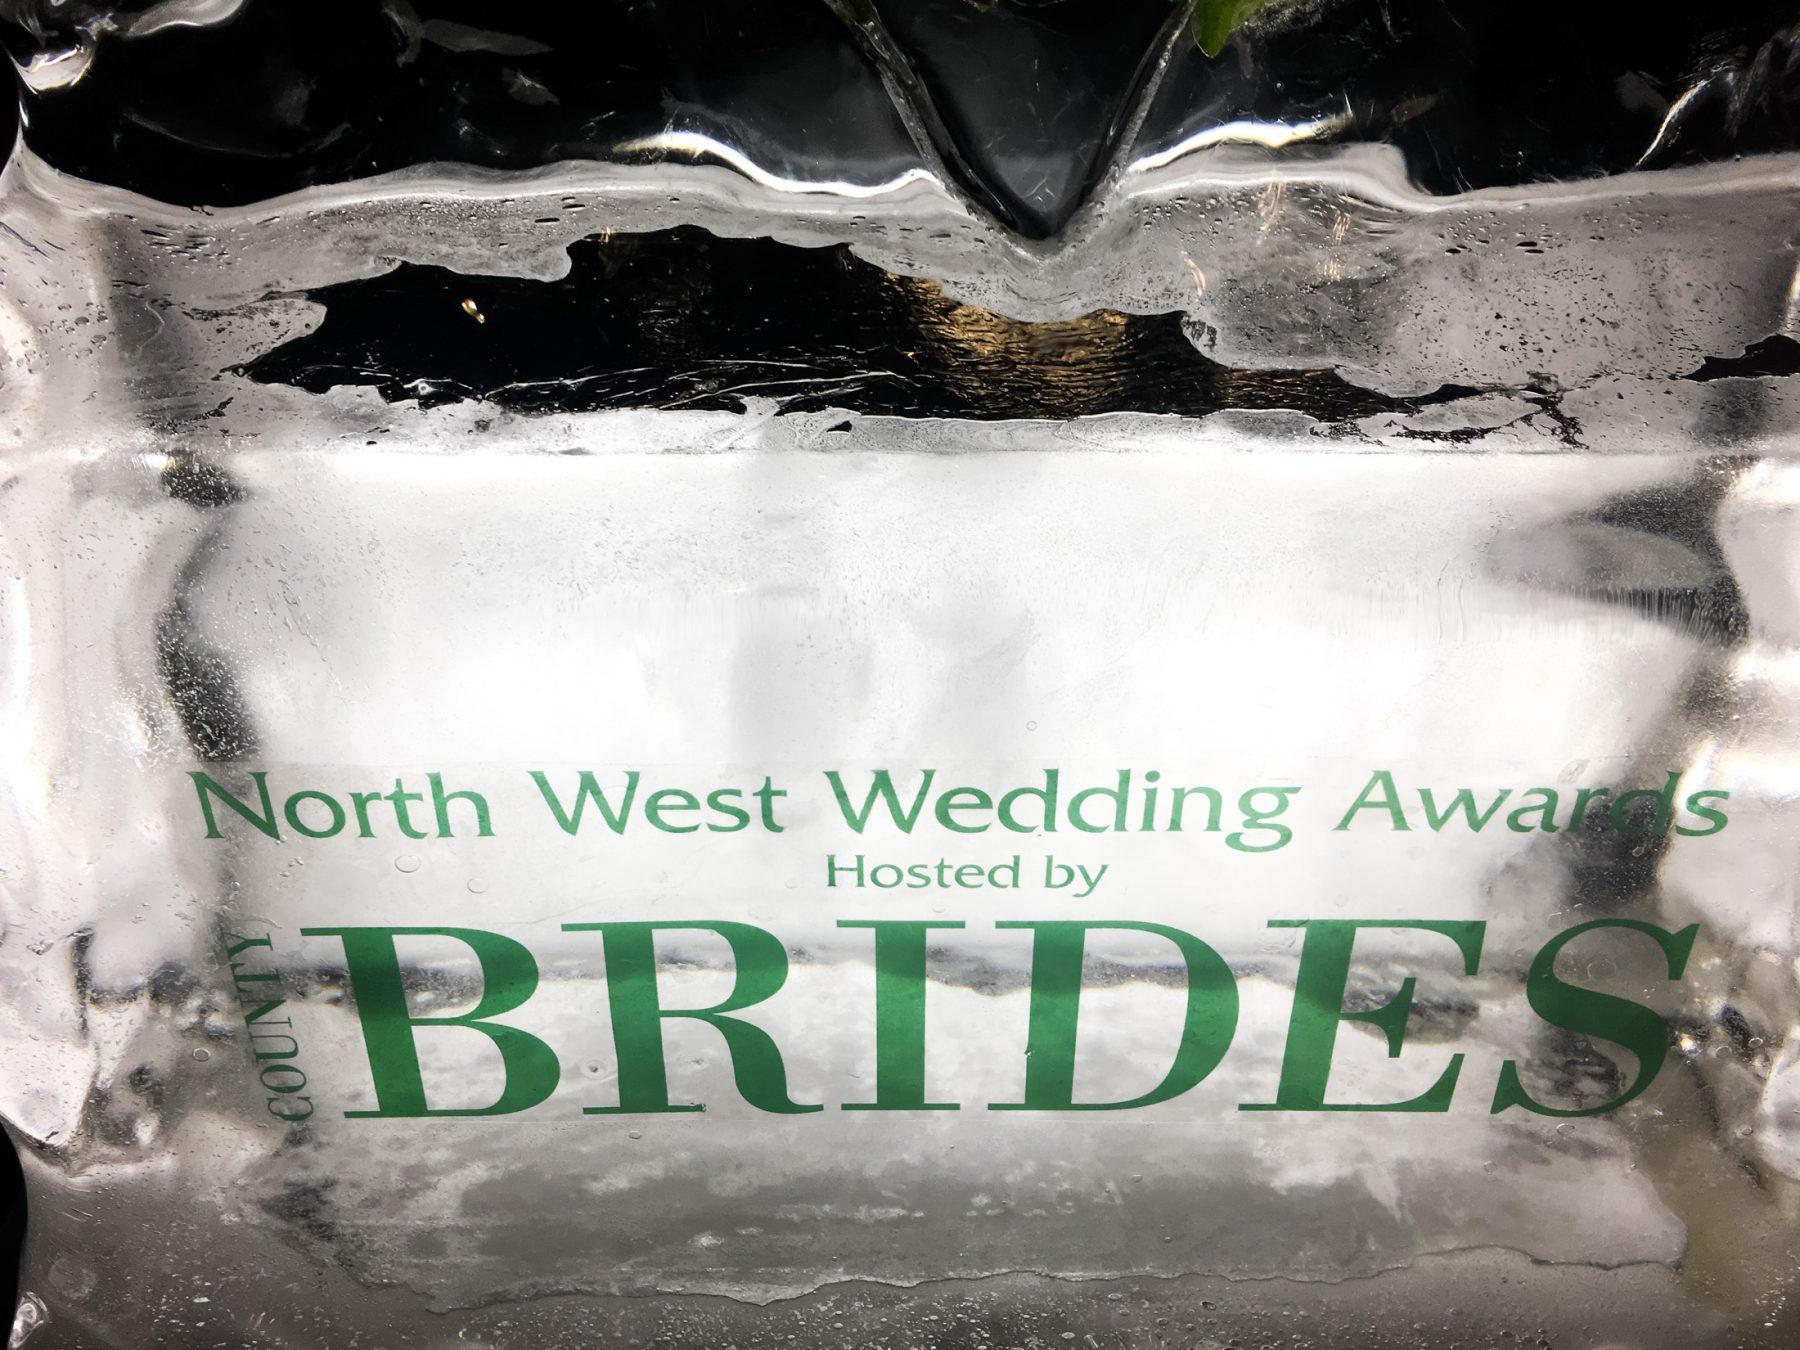 Ice sculpture in reception